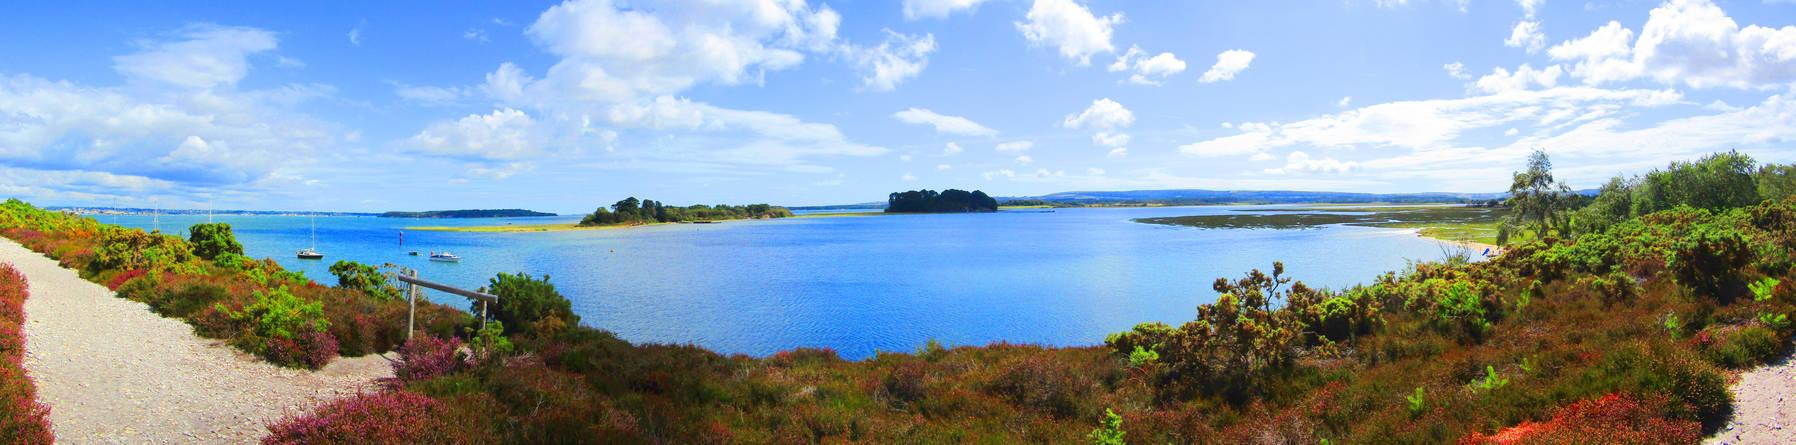 Dorset Island Panorama 2